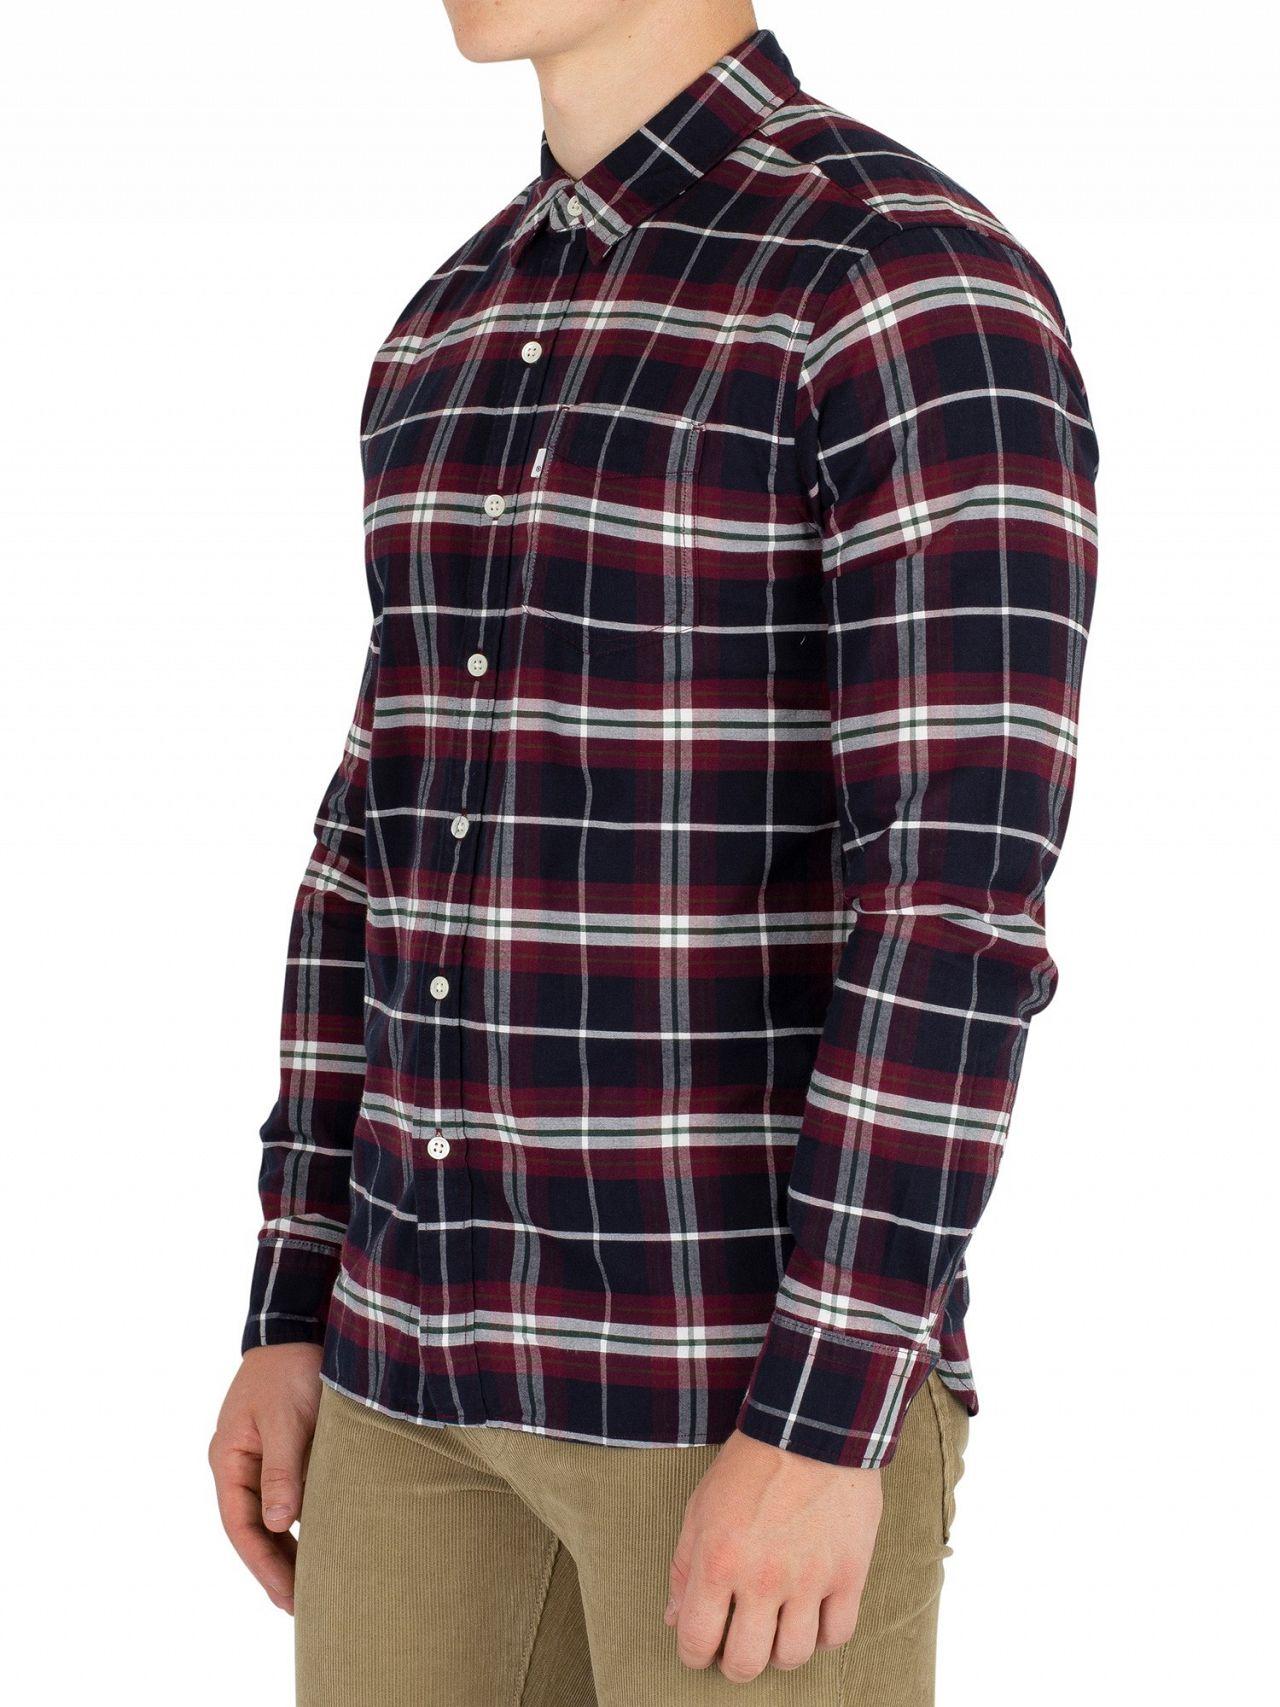 1696dbf55451 Levi s Wildcat Sunset Pocket Shirt